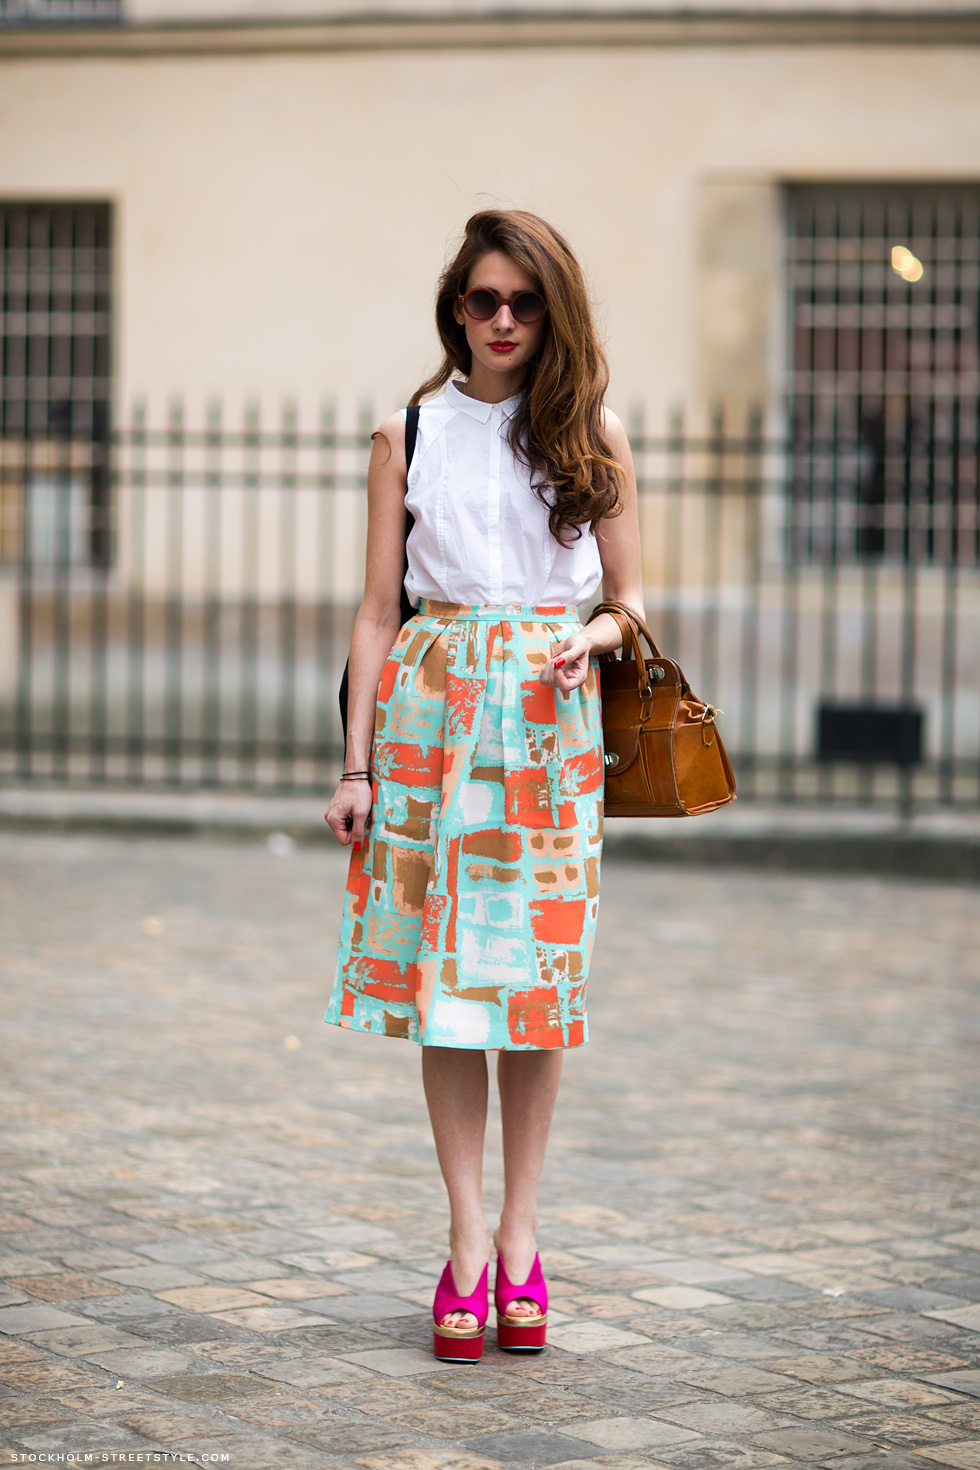 На фото: белая блузка с юбкой с принтом.